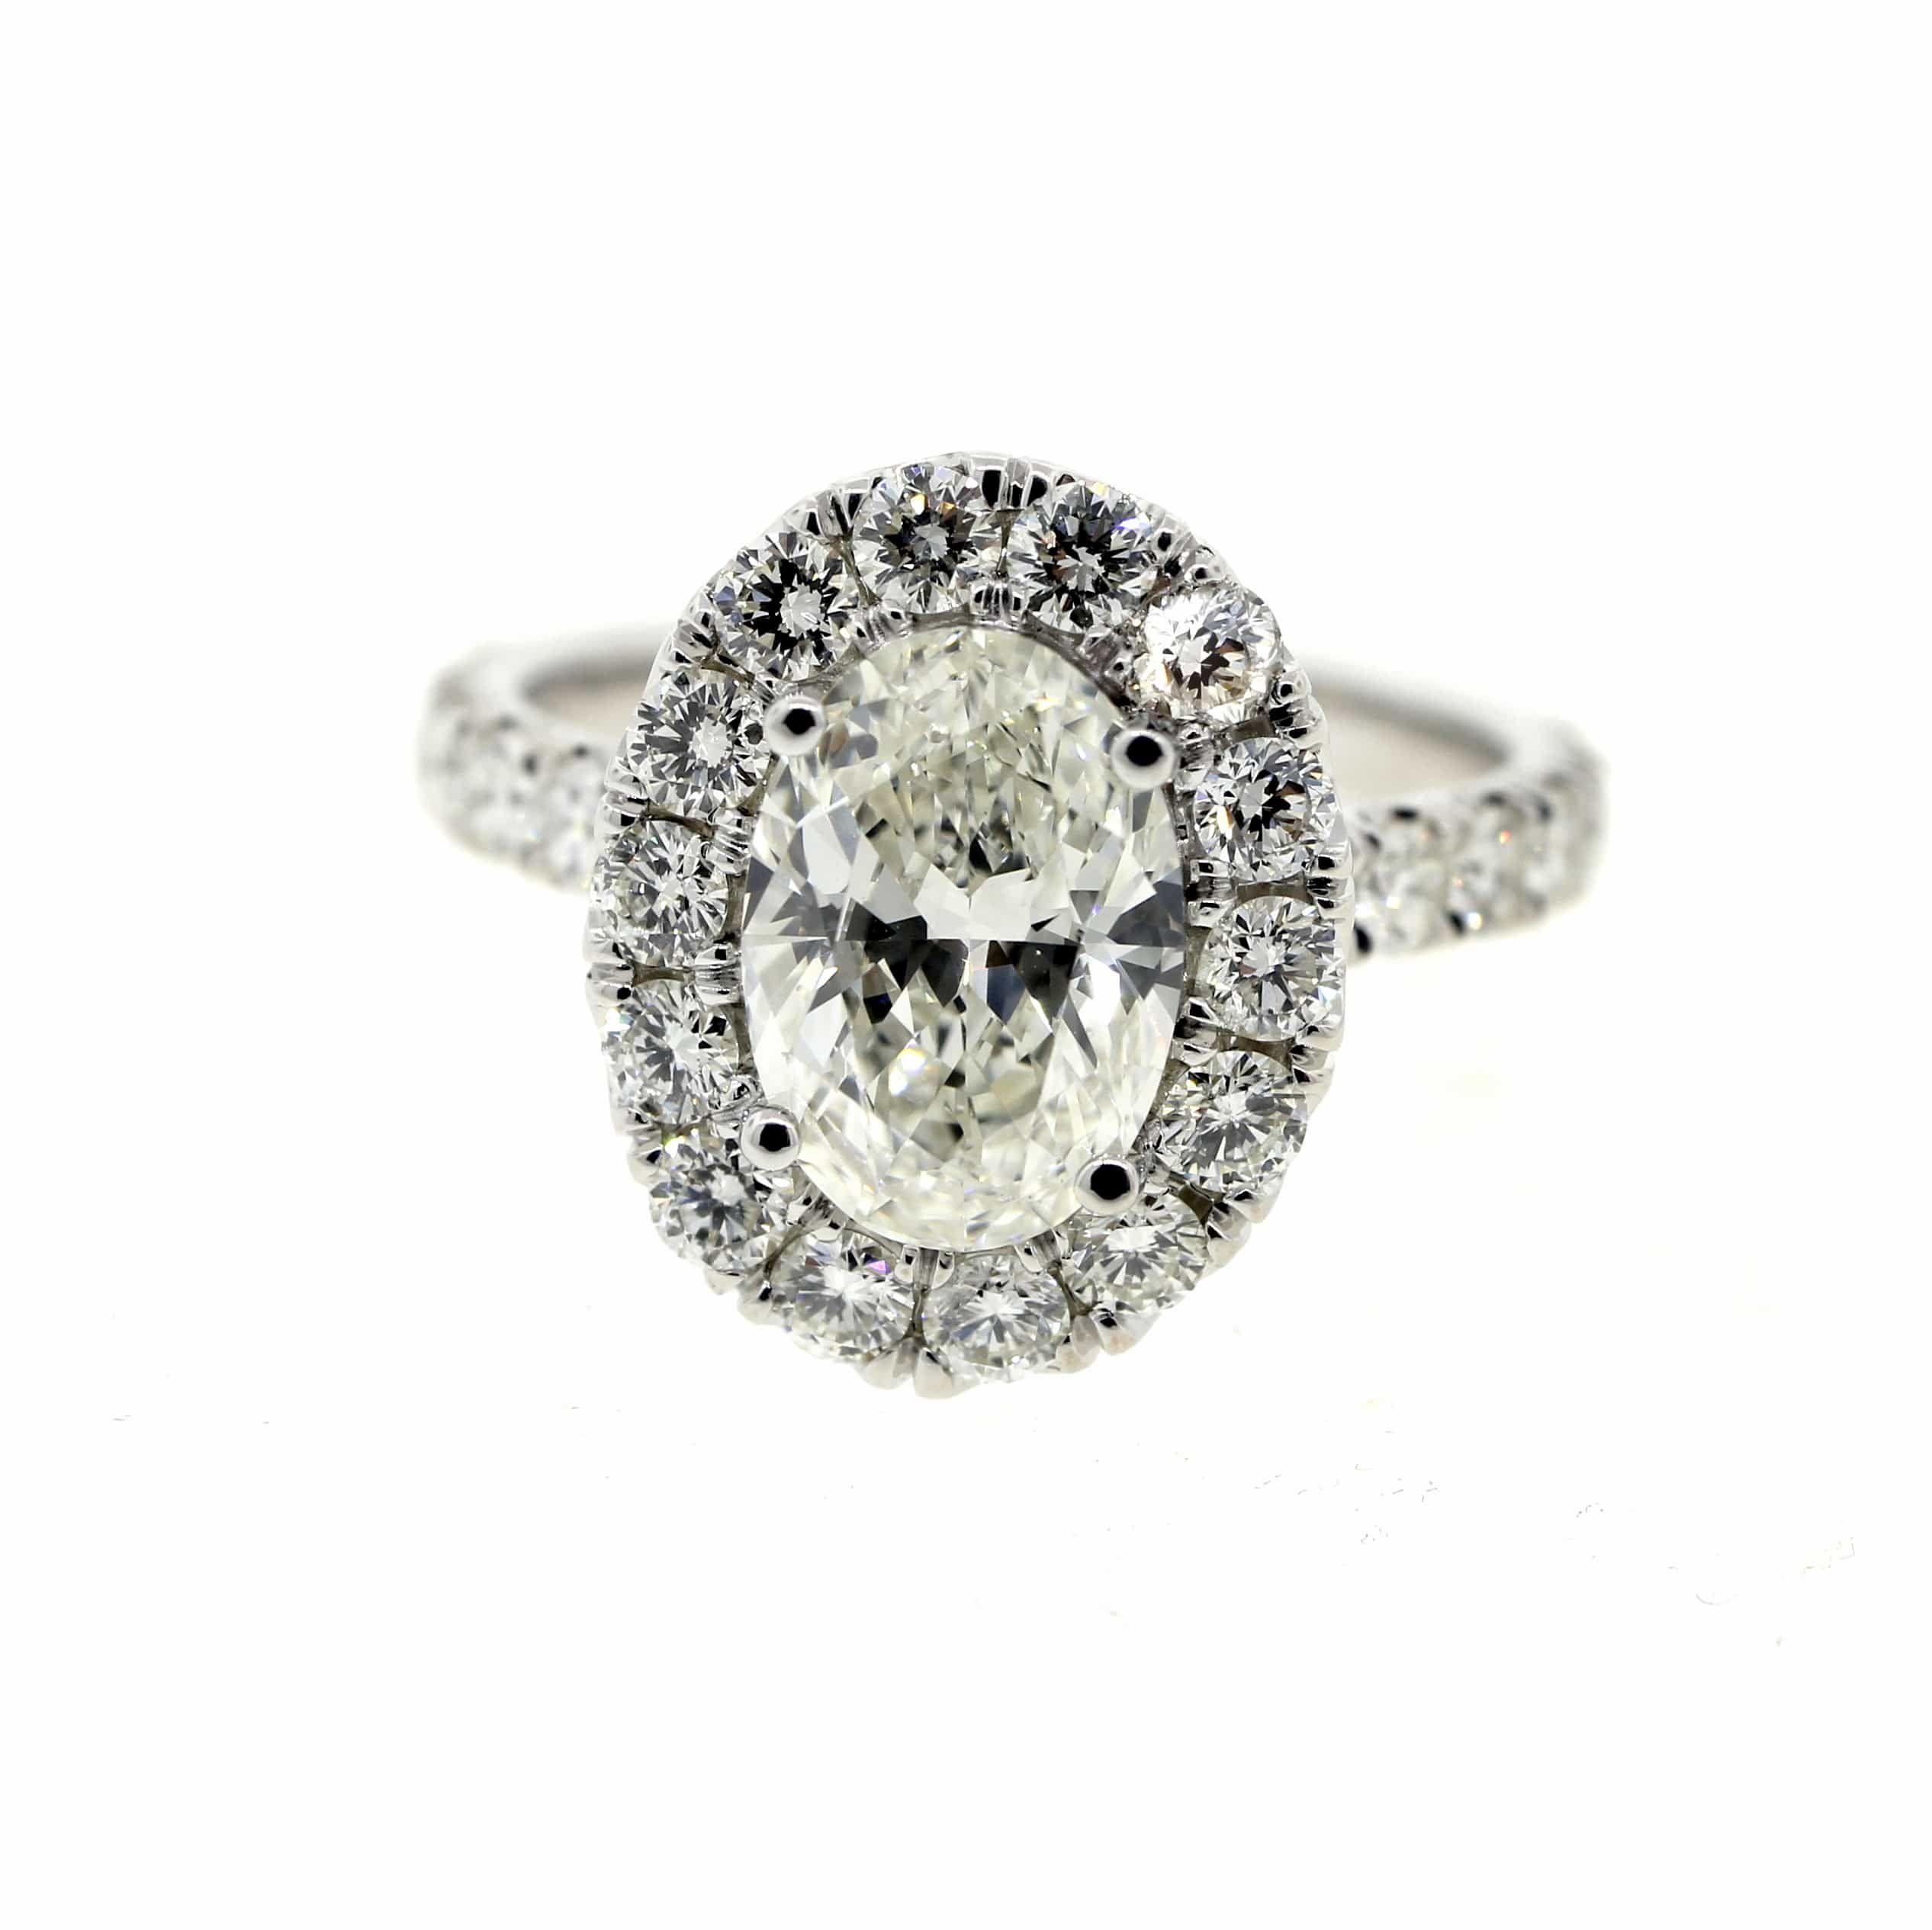 A mesmerizing platinum diamond engagement ring this beautiful ring